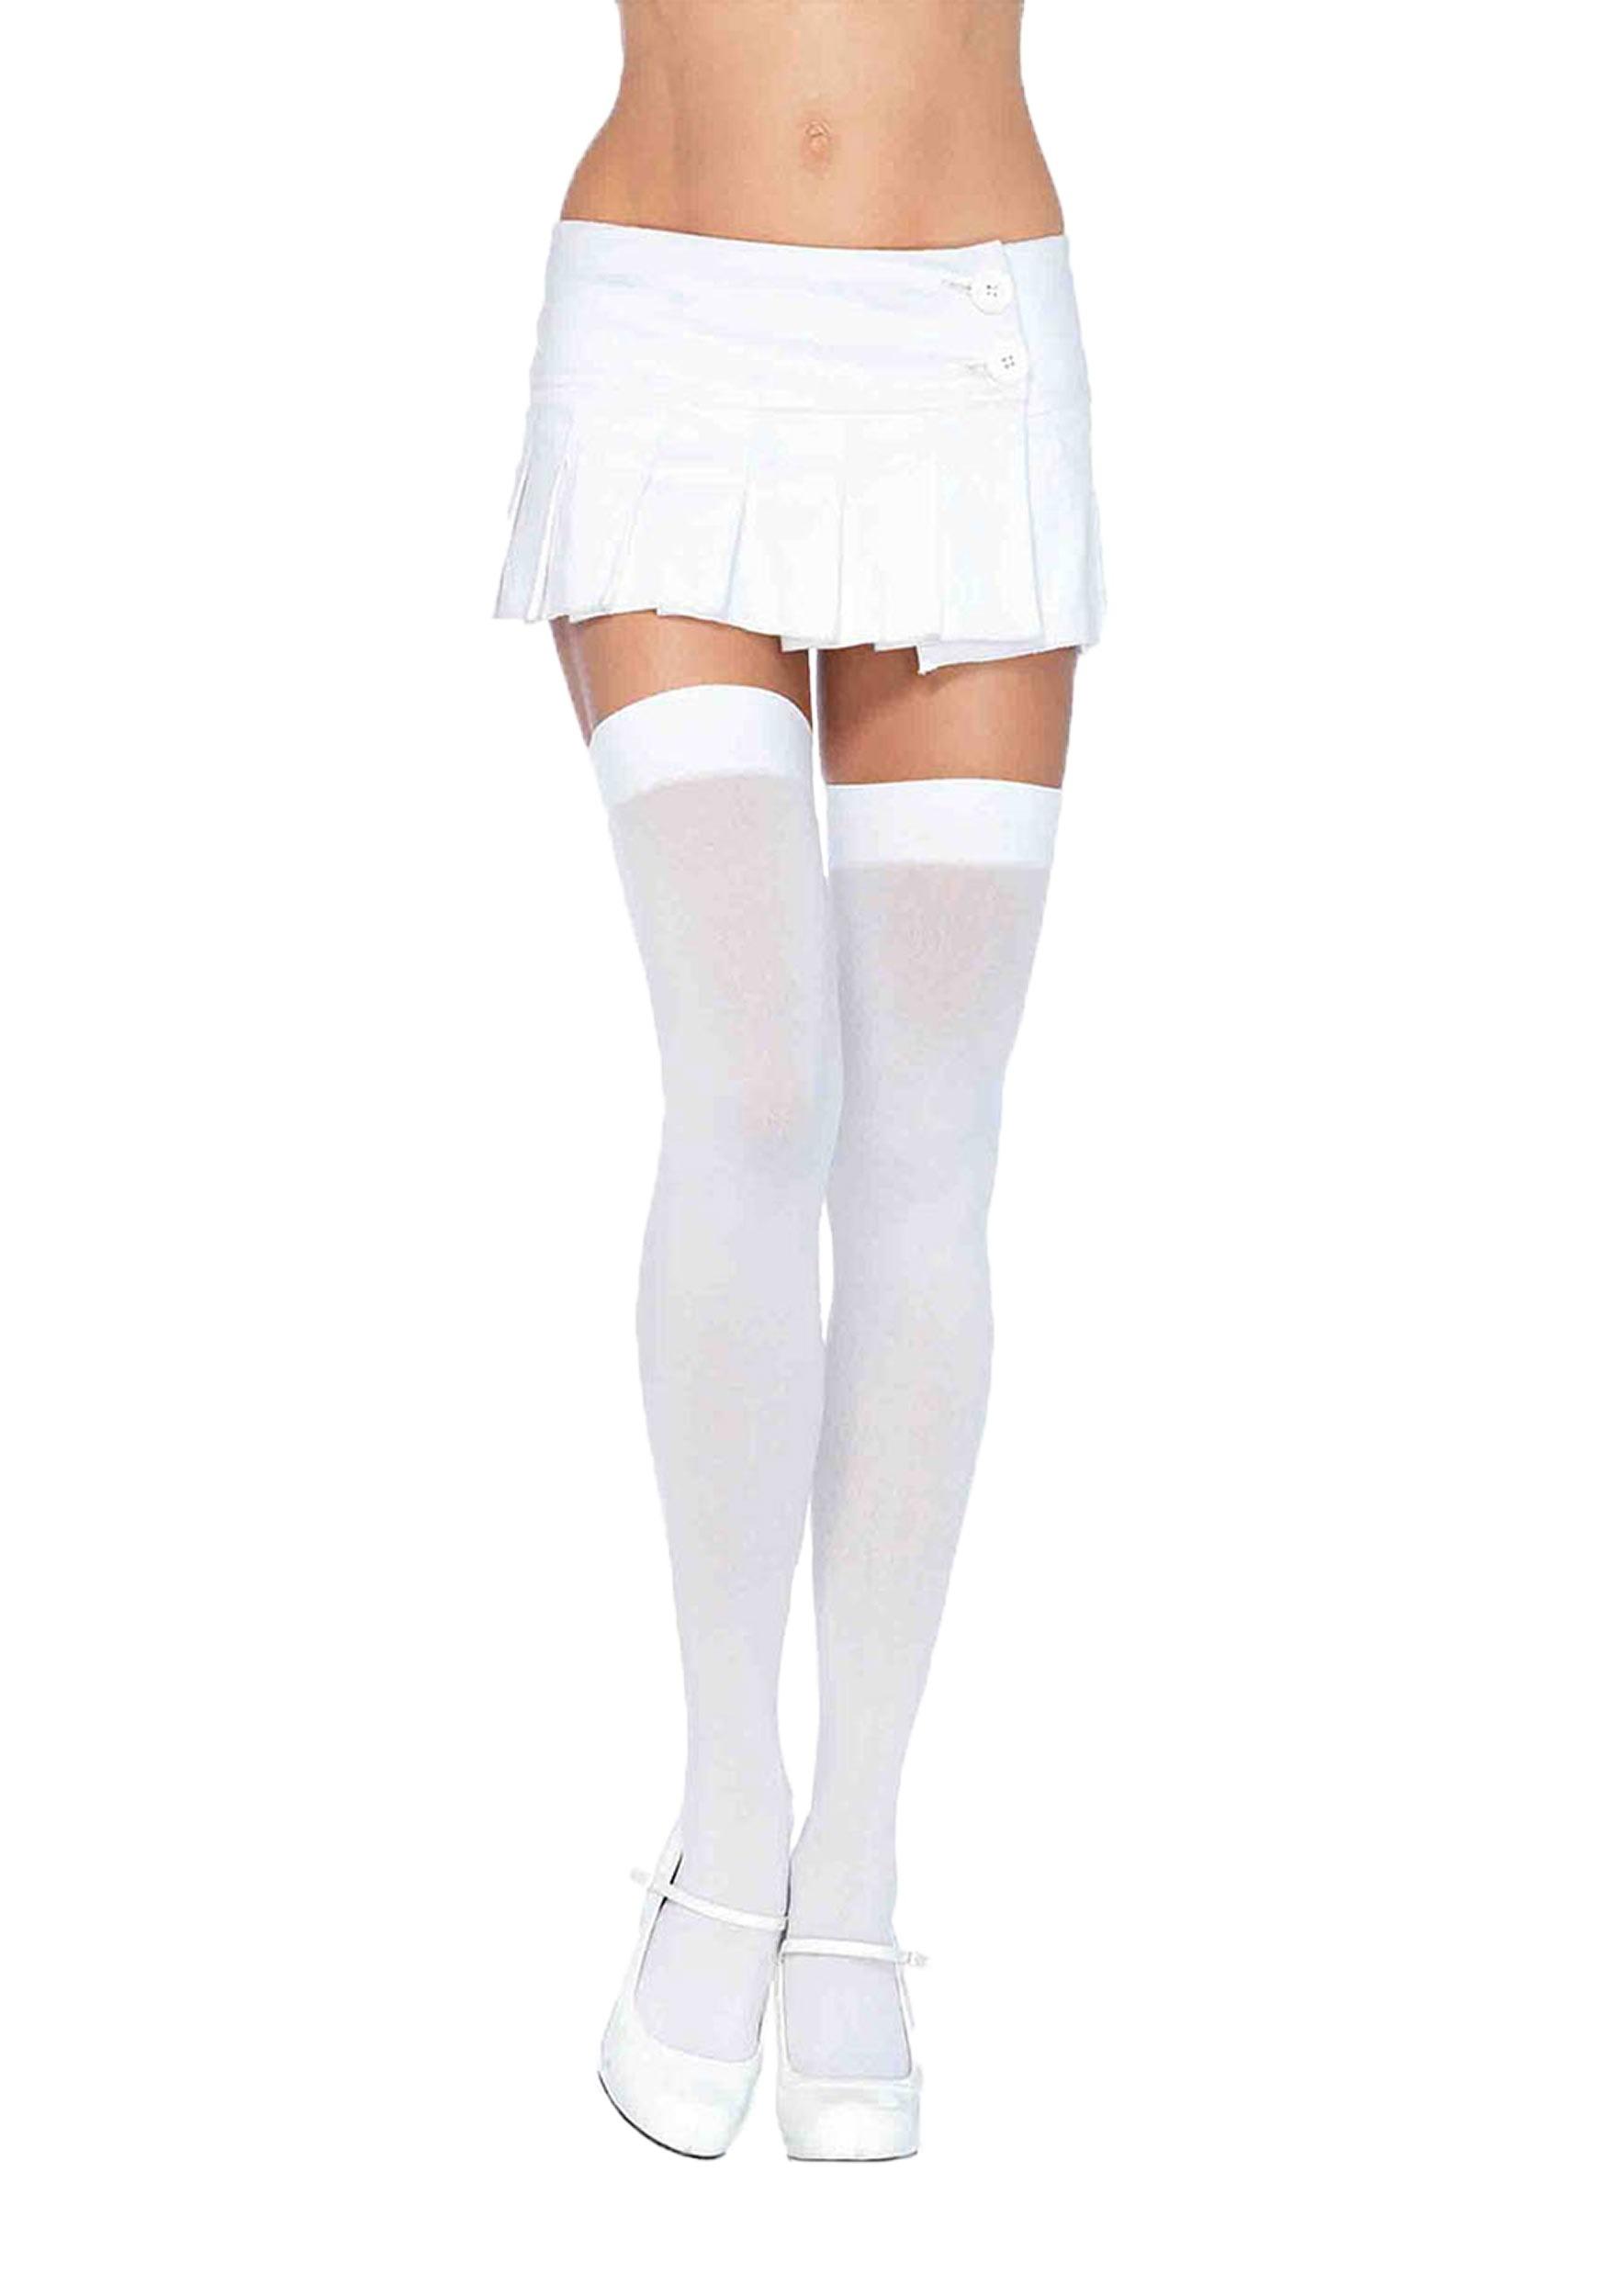 174f730643783 White Thigh High Stockings